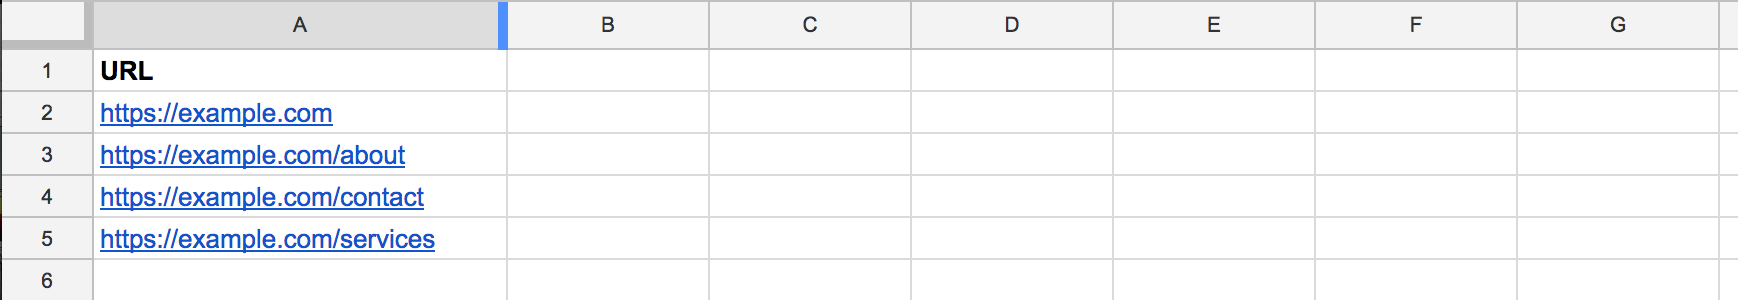 SEO URLs spreadsheet